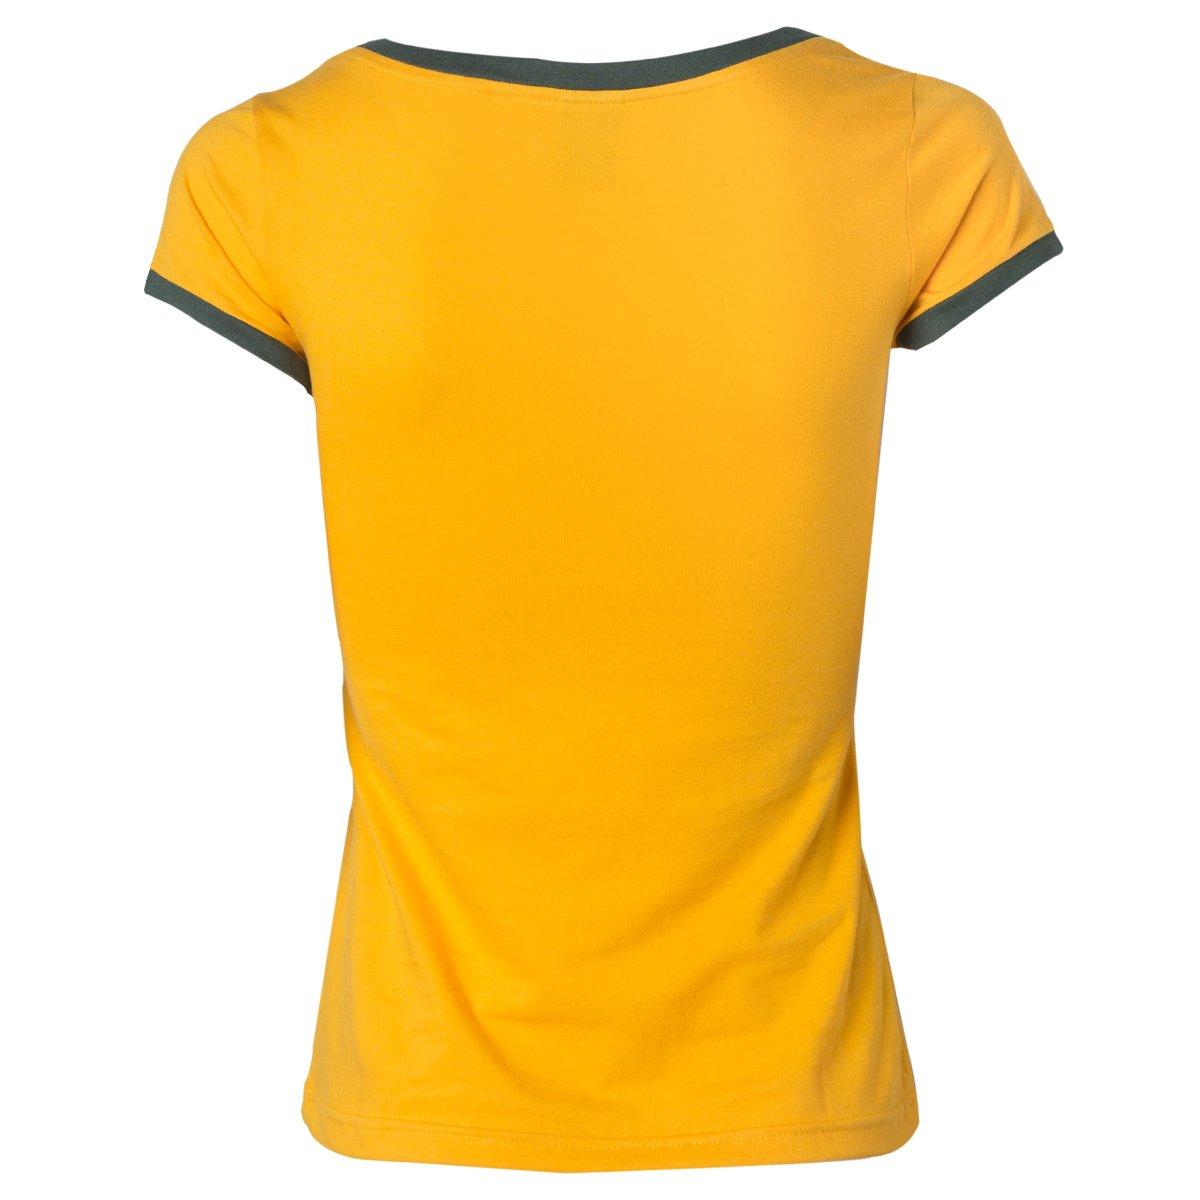 786cf8ad25 ... Camisa Baby Look Seleção Do Brasil Torcedor Retrô Gol Cotton Basic  Feminina ...